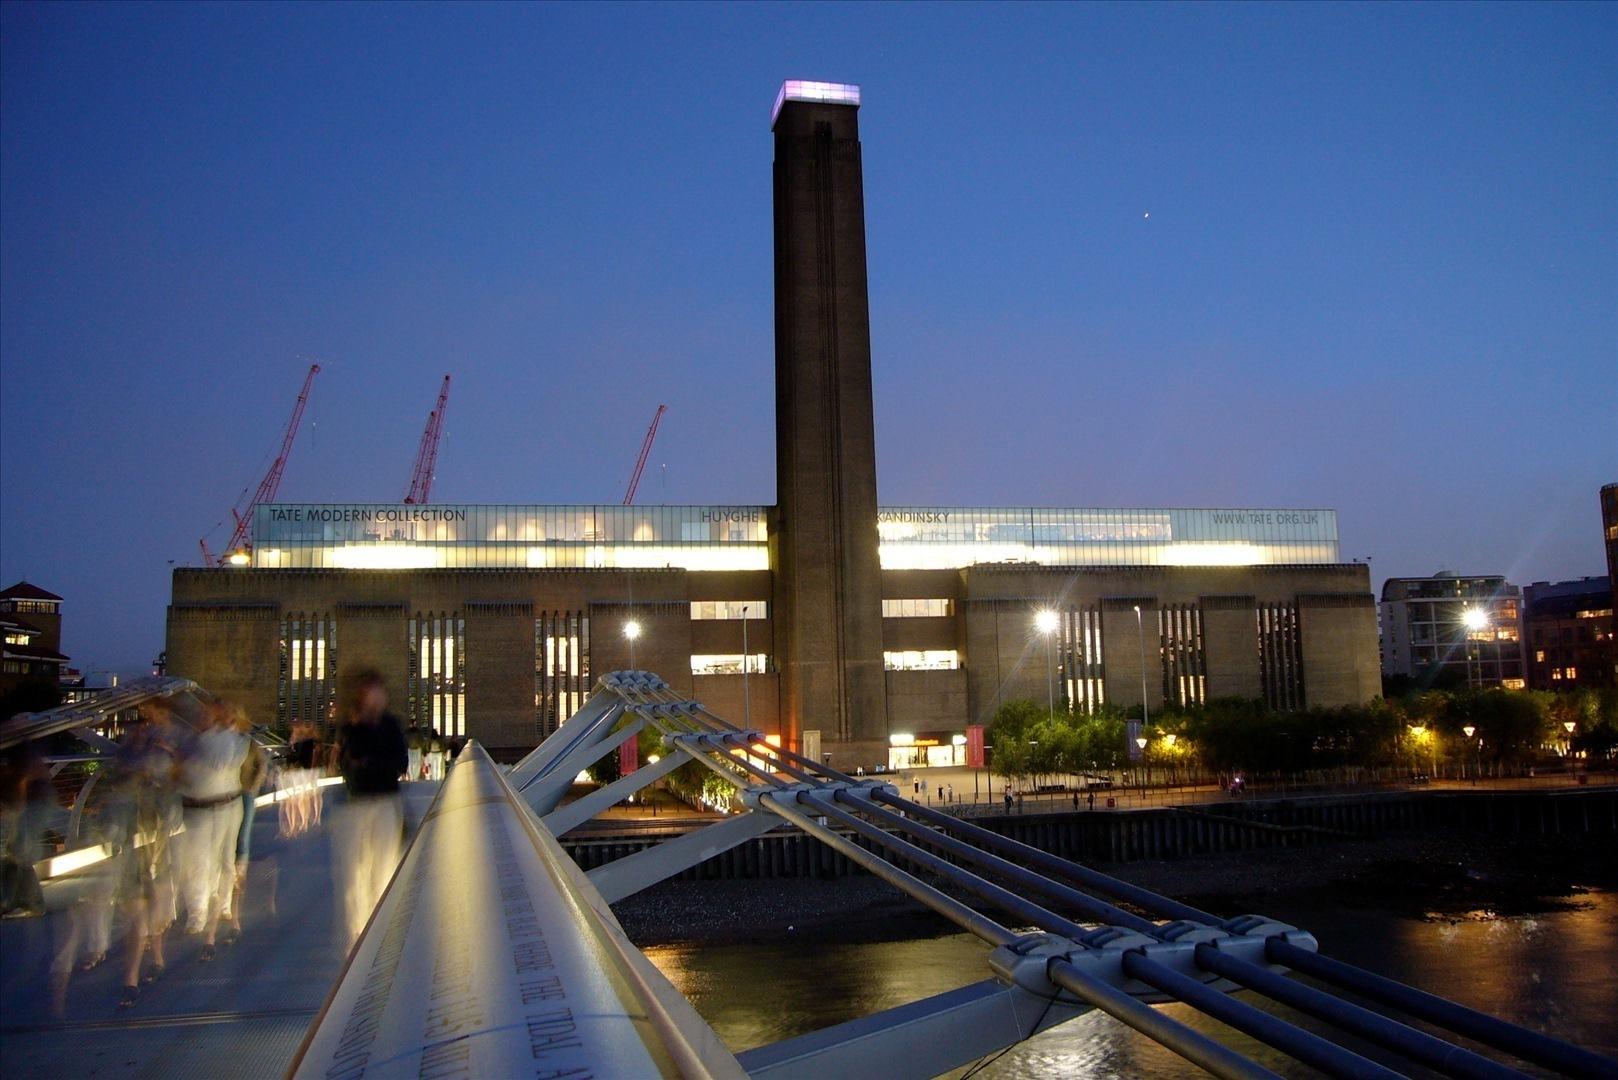 Tate-Modern-London-Beautiful.jpg